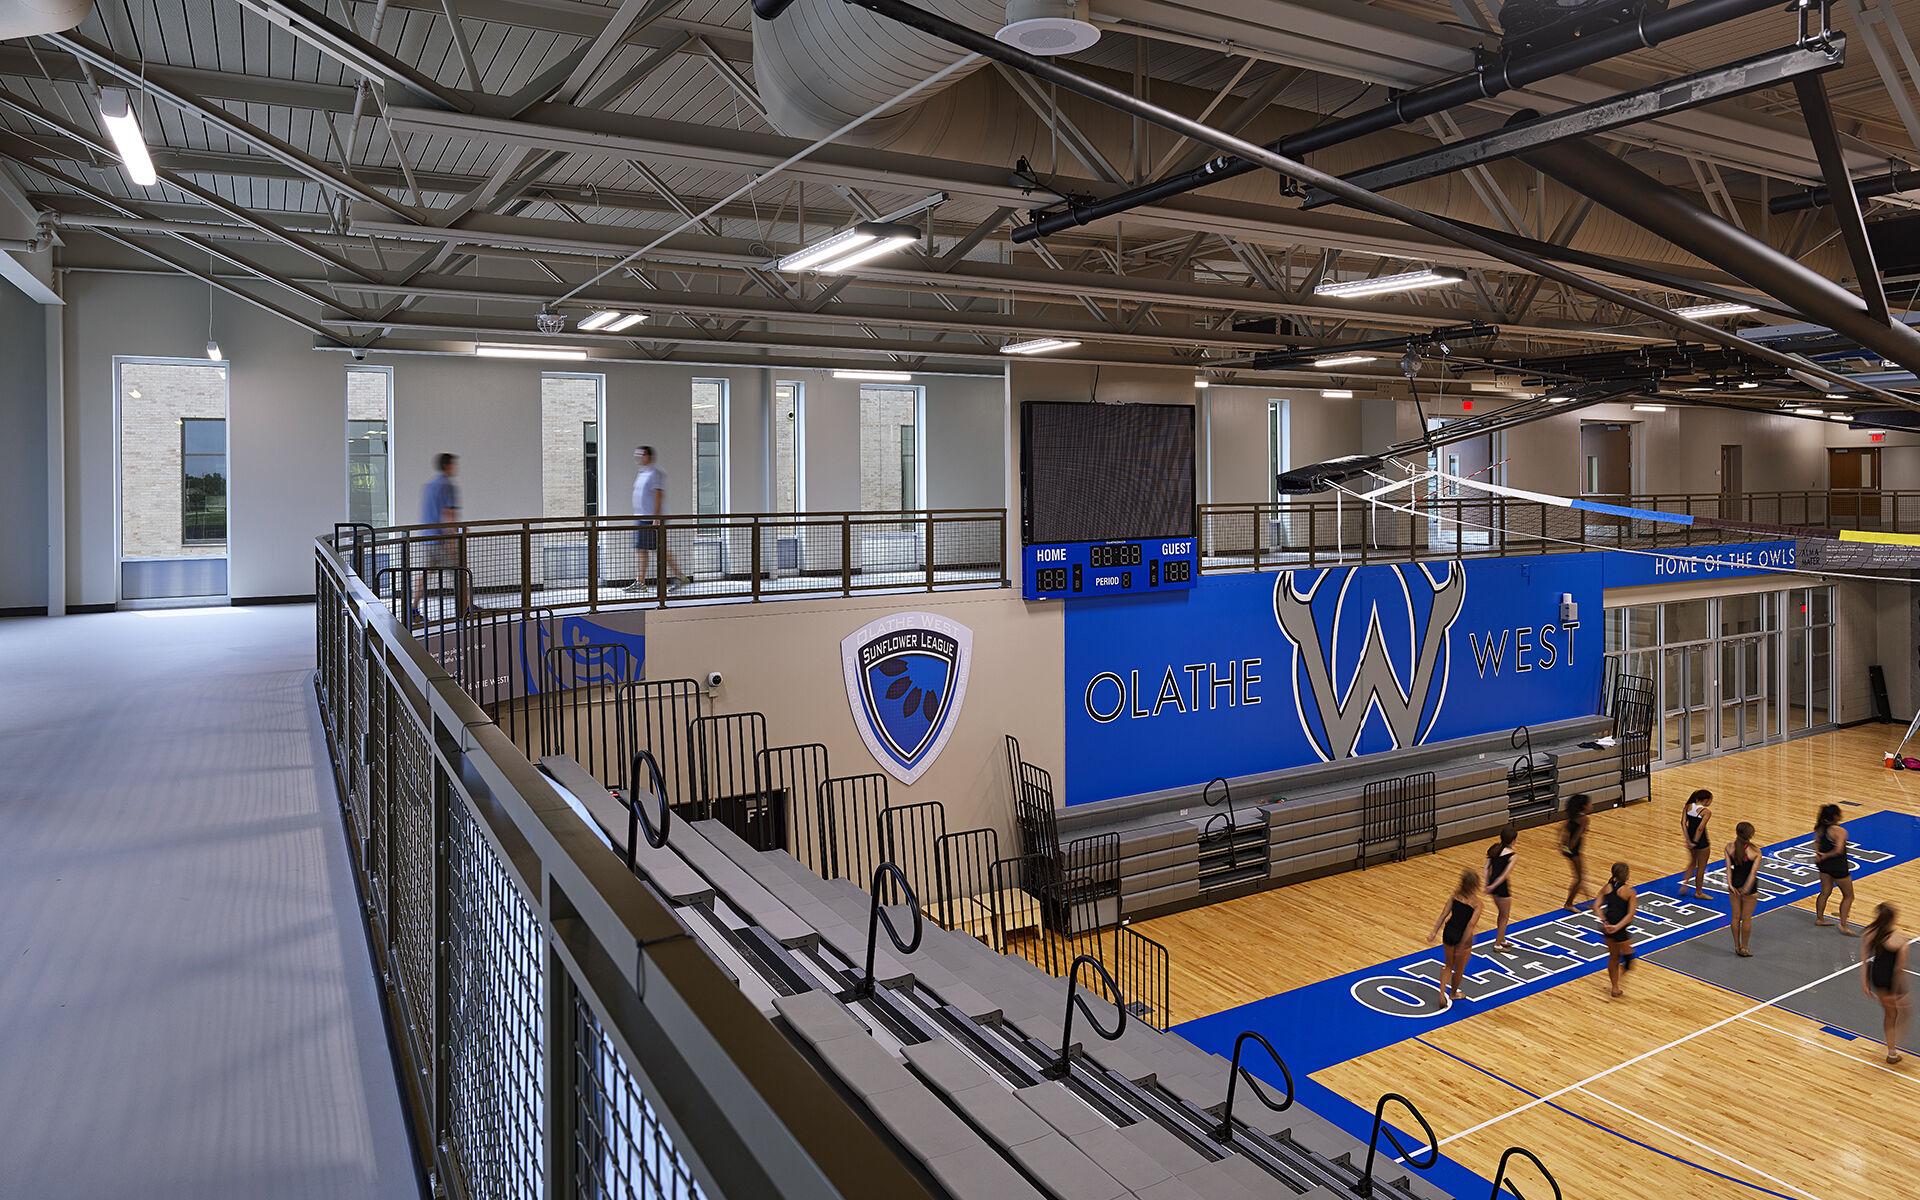 Olathe West High School - Olathe Public Schools USD 233